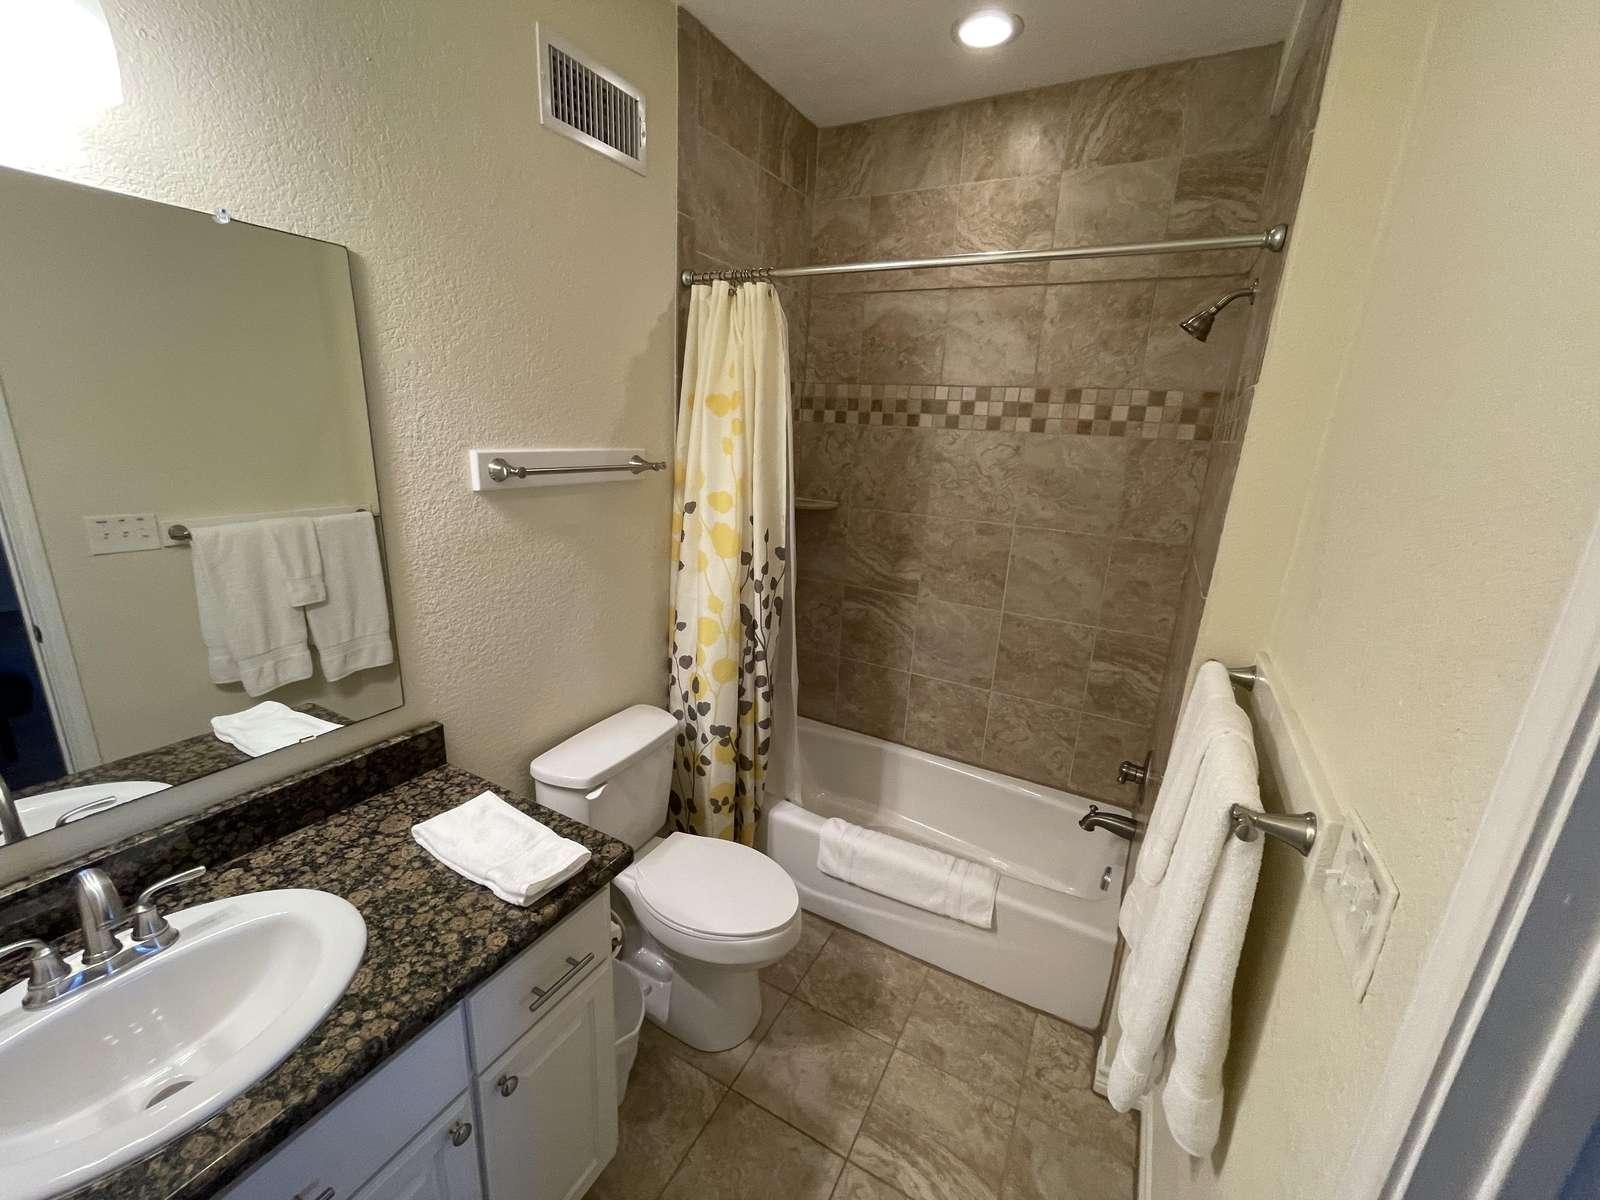 The gameroom bathroom.